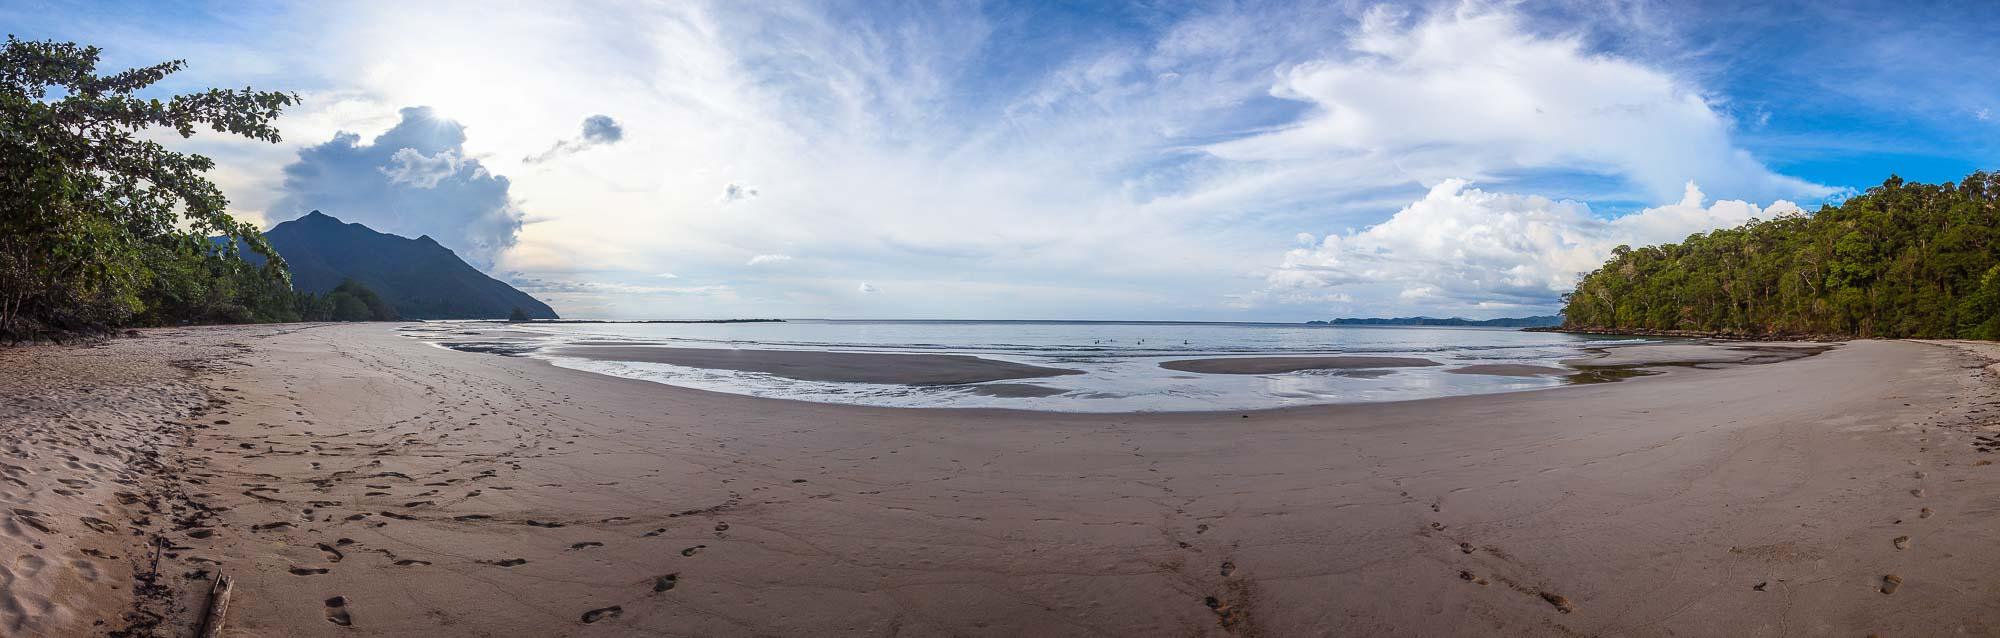 Prilippines tropical panoramas - Beaches of Palawan